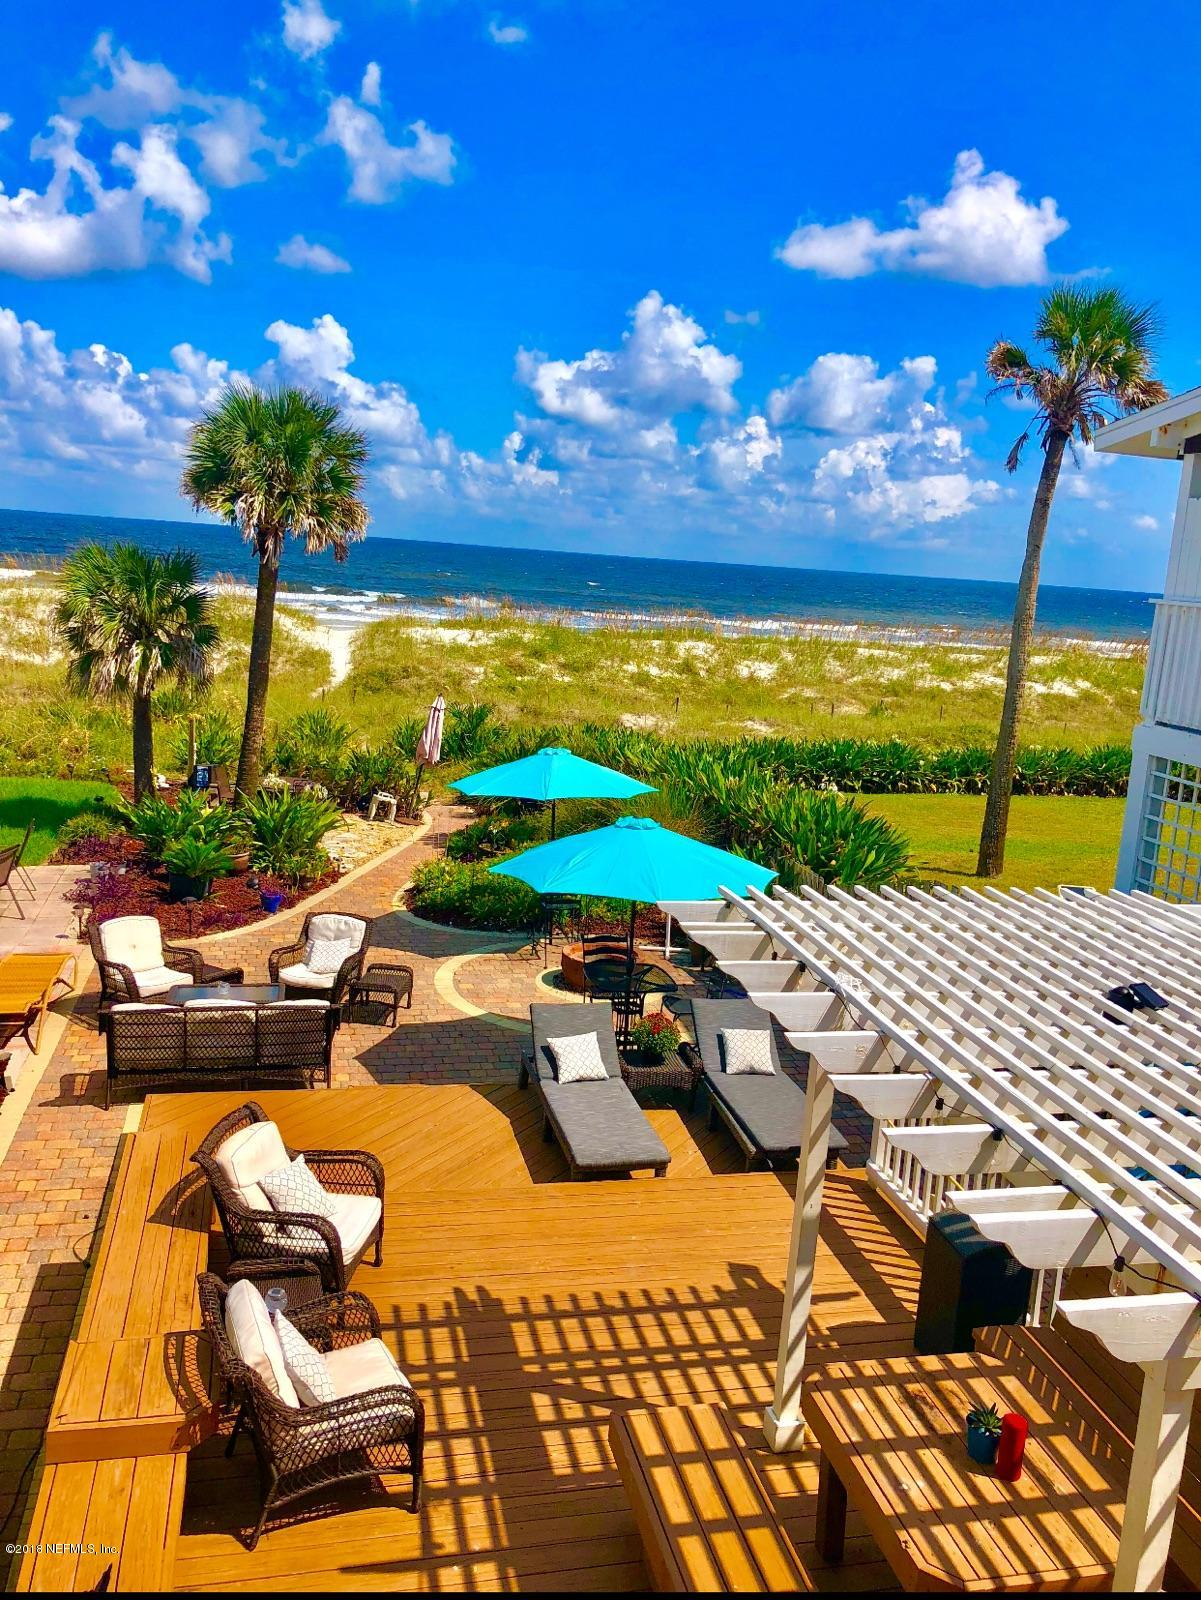 506 OCEAN FRONT, NEPTUNE BEACH, FLORIDA 32266, 4 Bedrooms Bedrooms, ,3 BathroomsBathrooms,Residential Income,For sale,OCEAN FRONT,961728